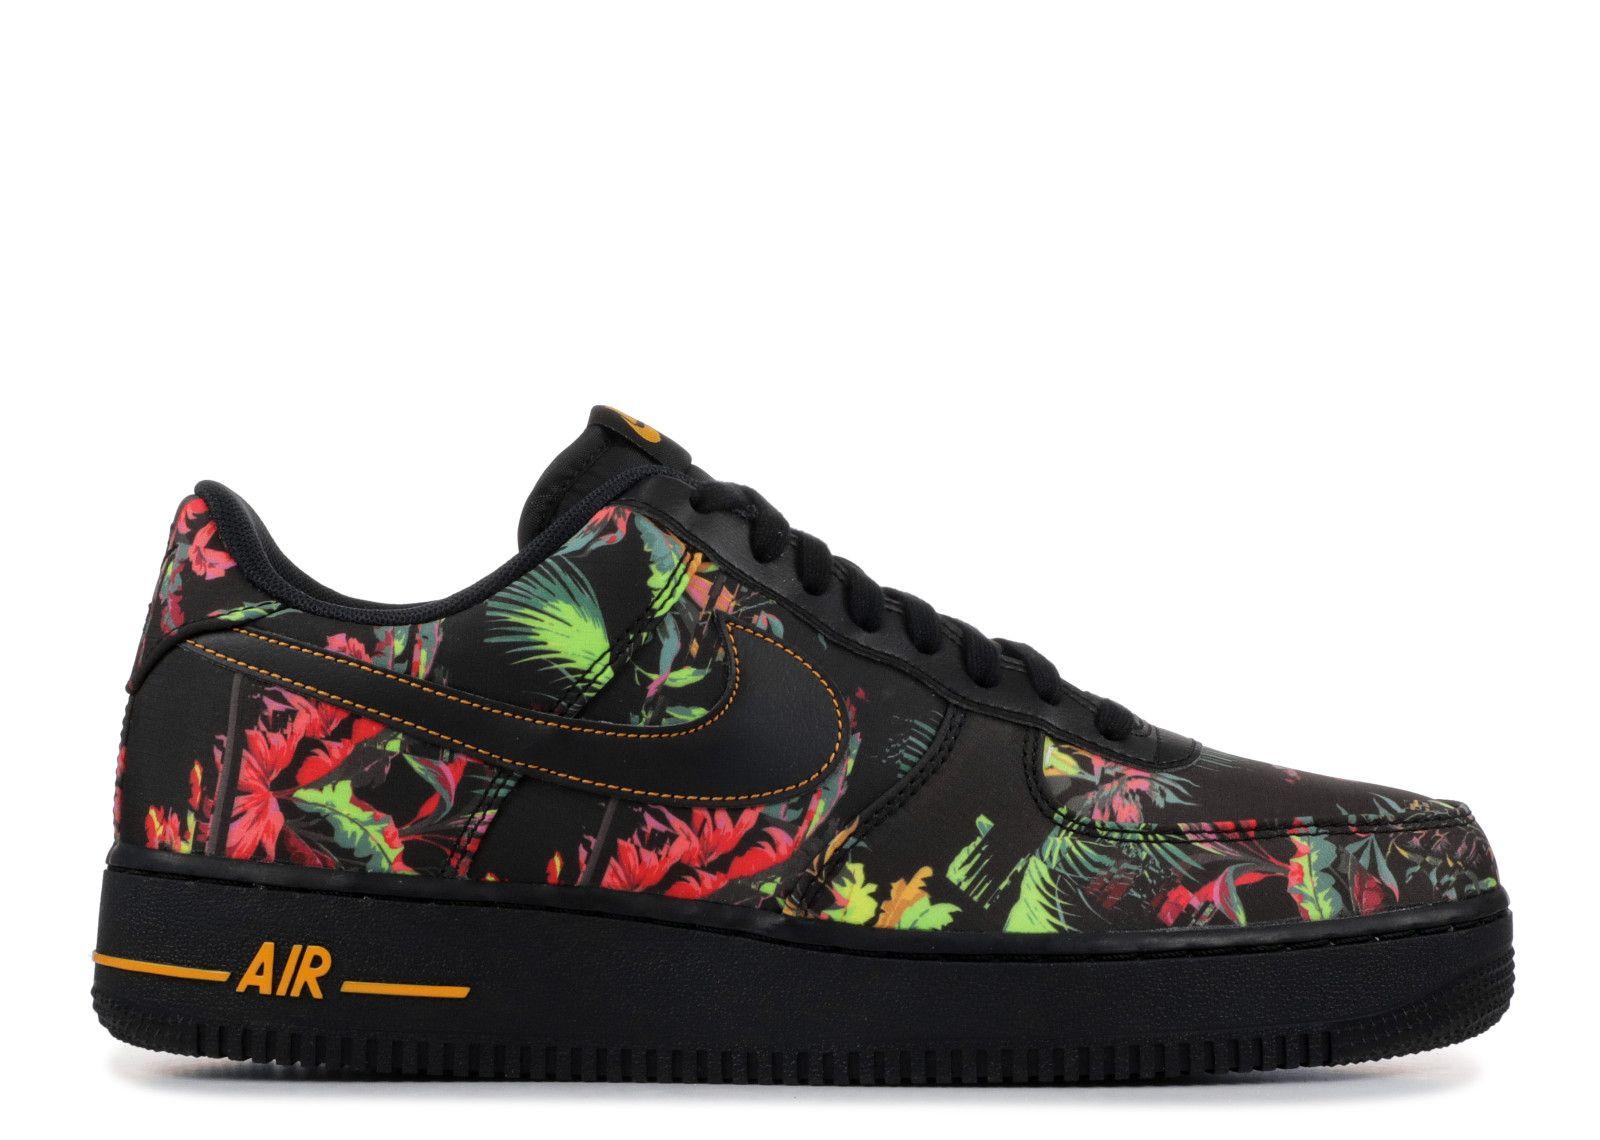 Air Force 1 '07 Lv8 Nike bv6068 001 black/multi